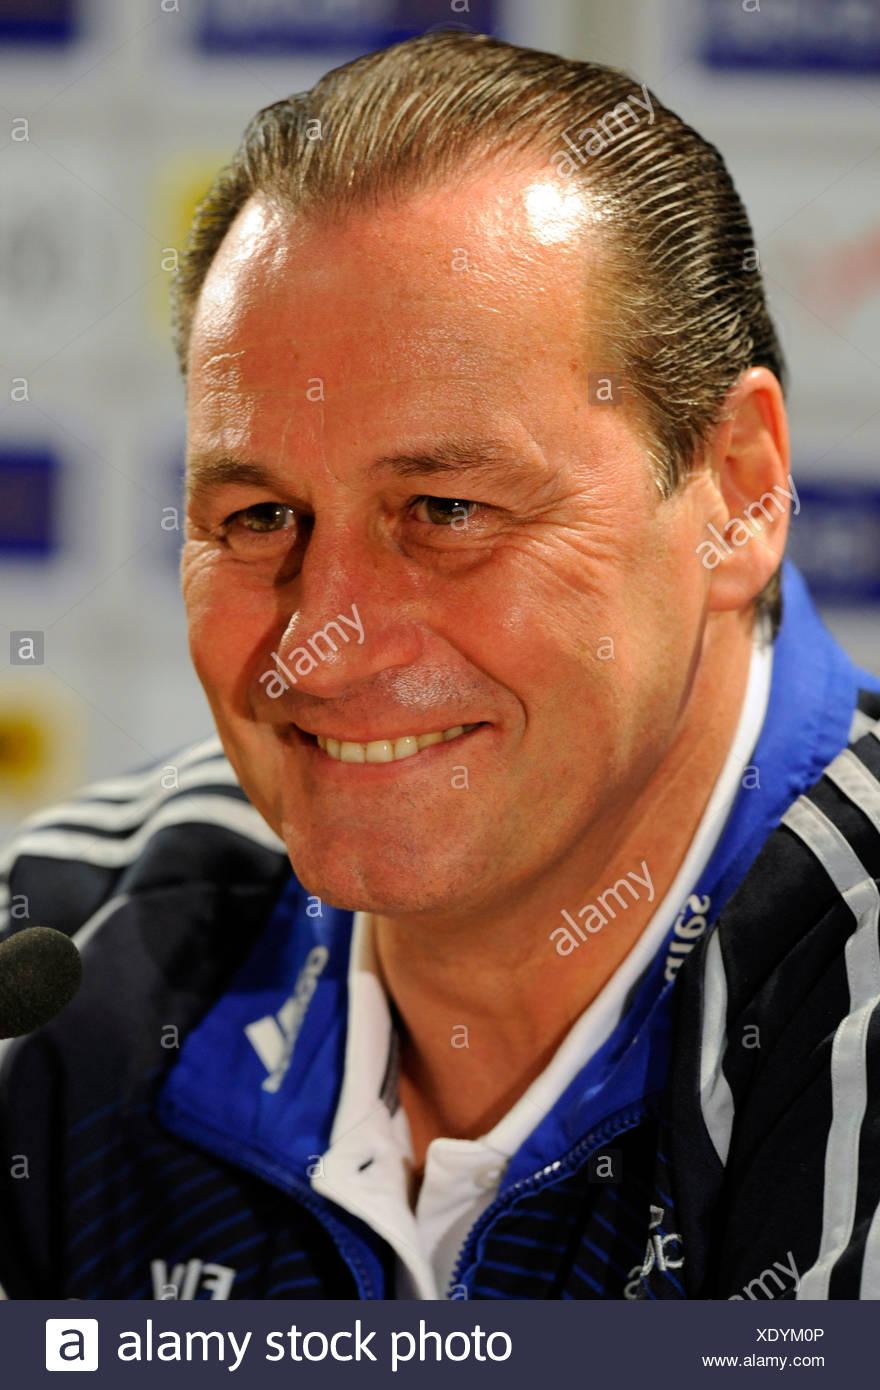 Coach Huub Stevens, Hamburger SV football club - Stock Image